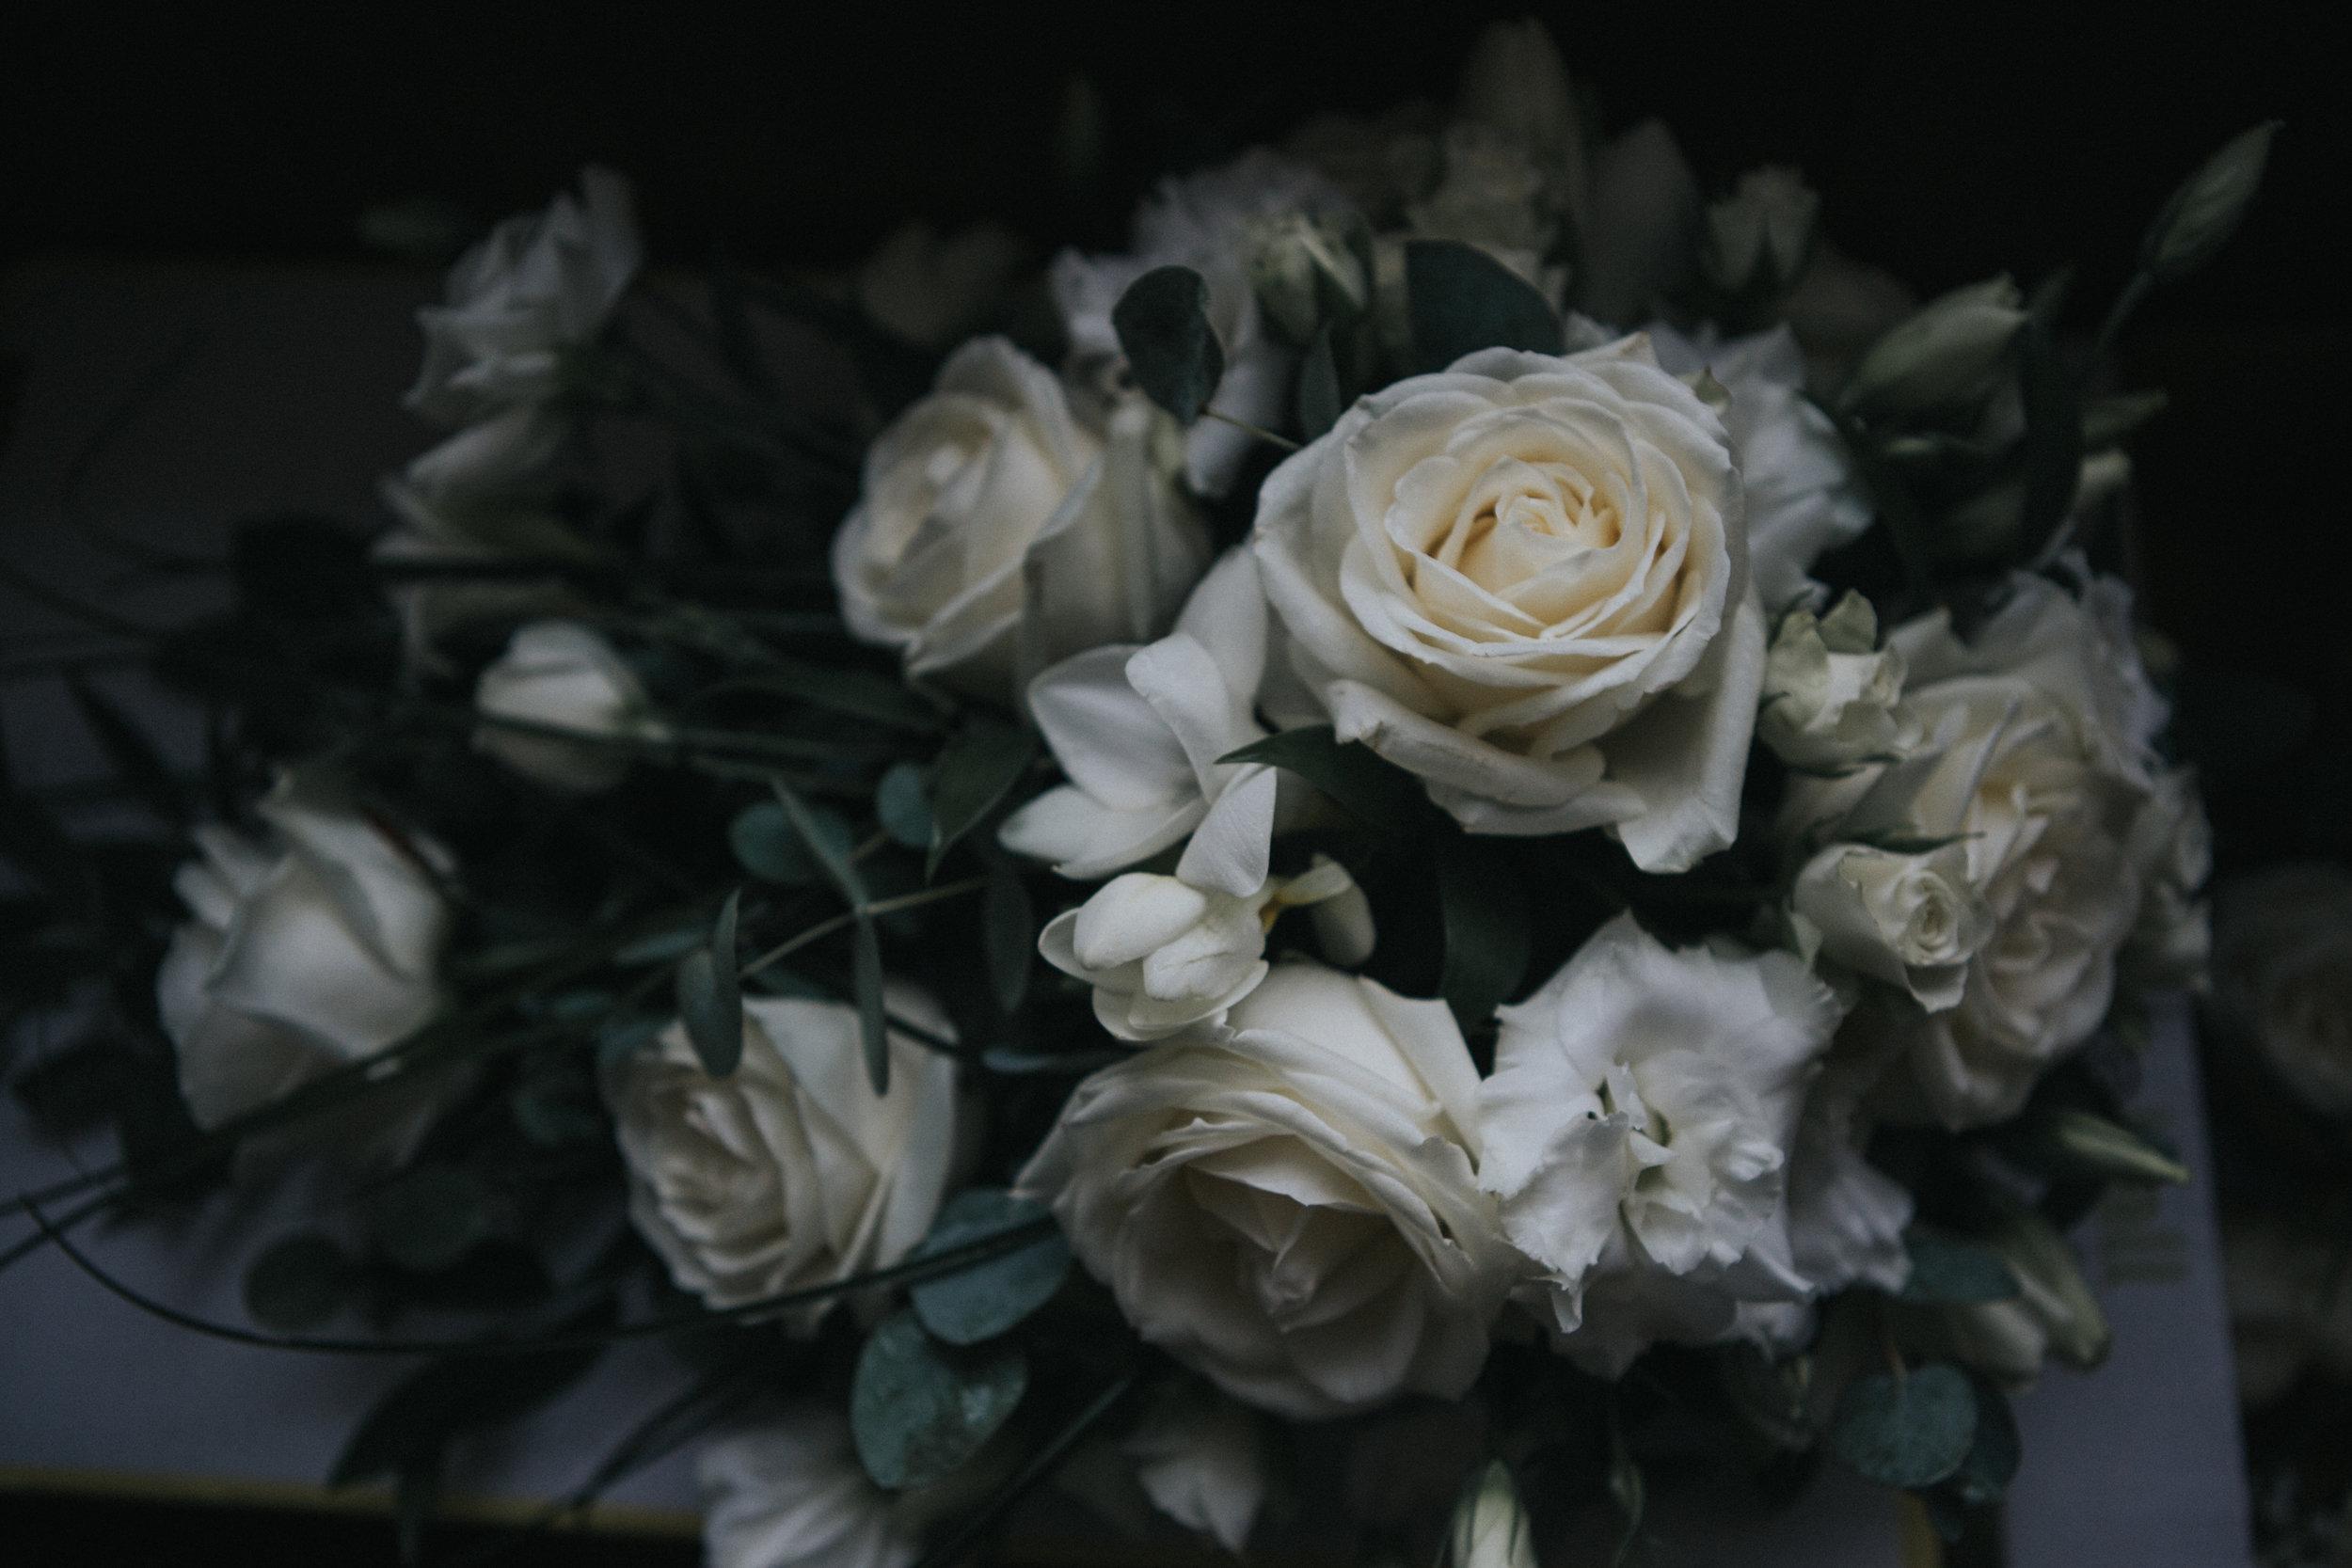 westenhangar-castle-kent-london-wedding-photography-flowers-02